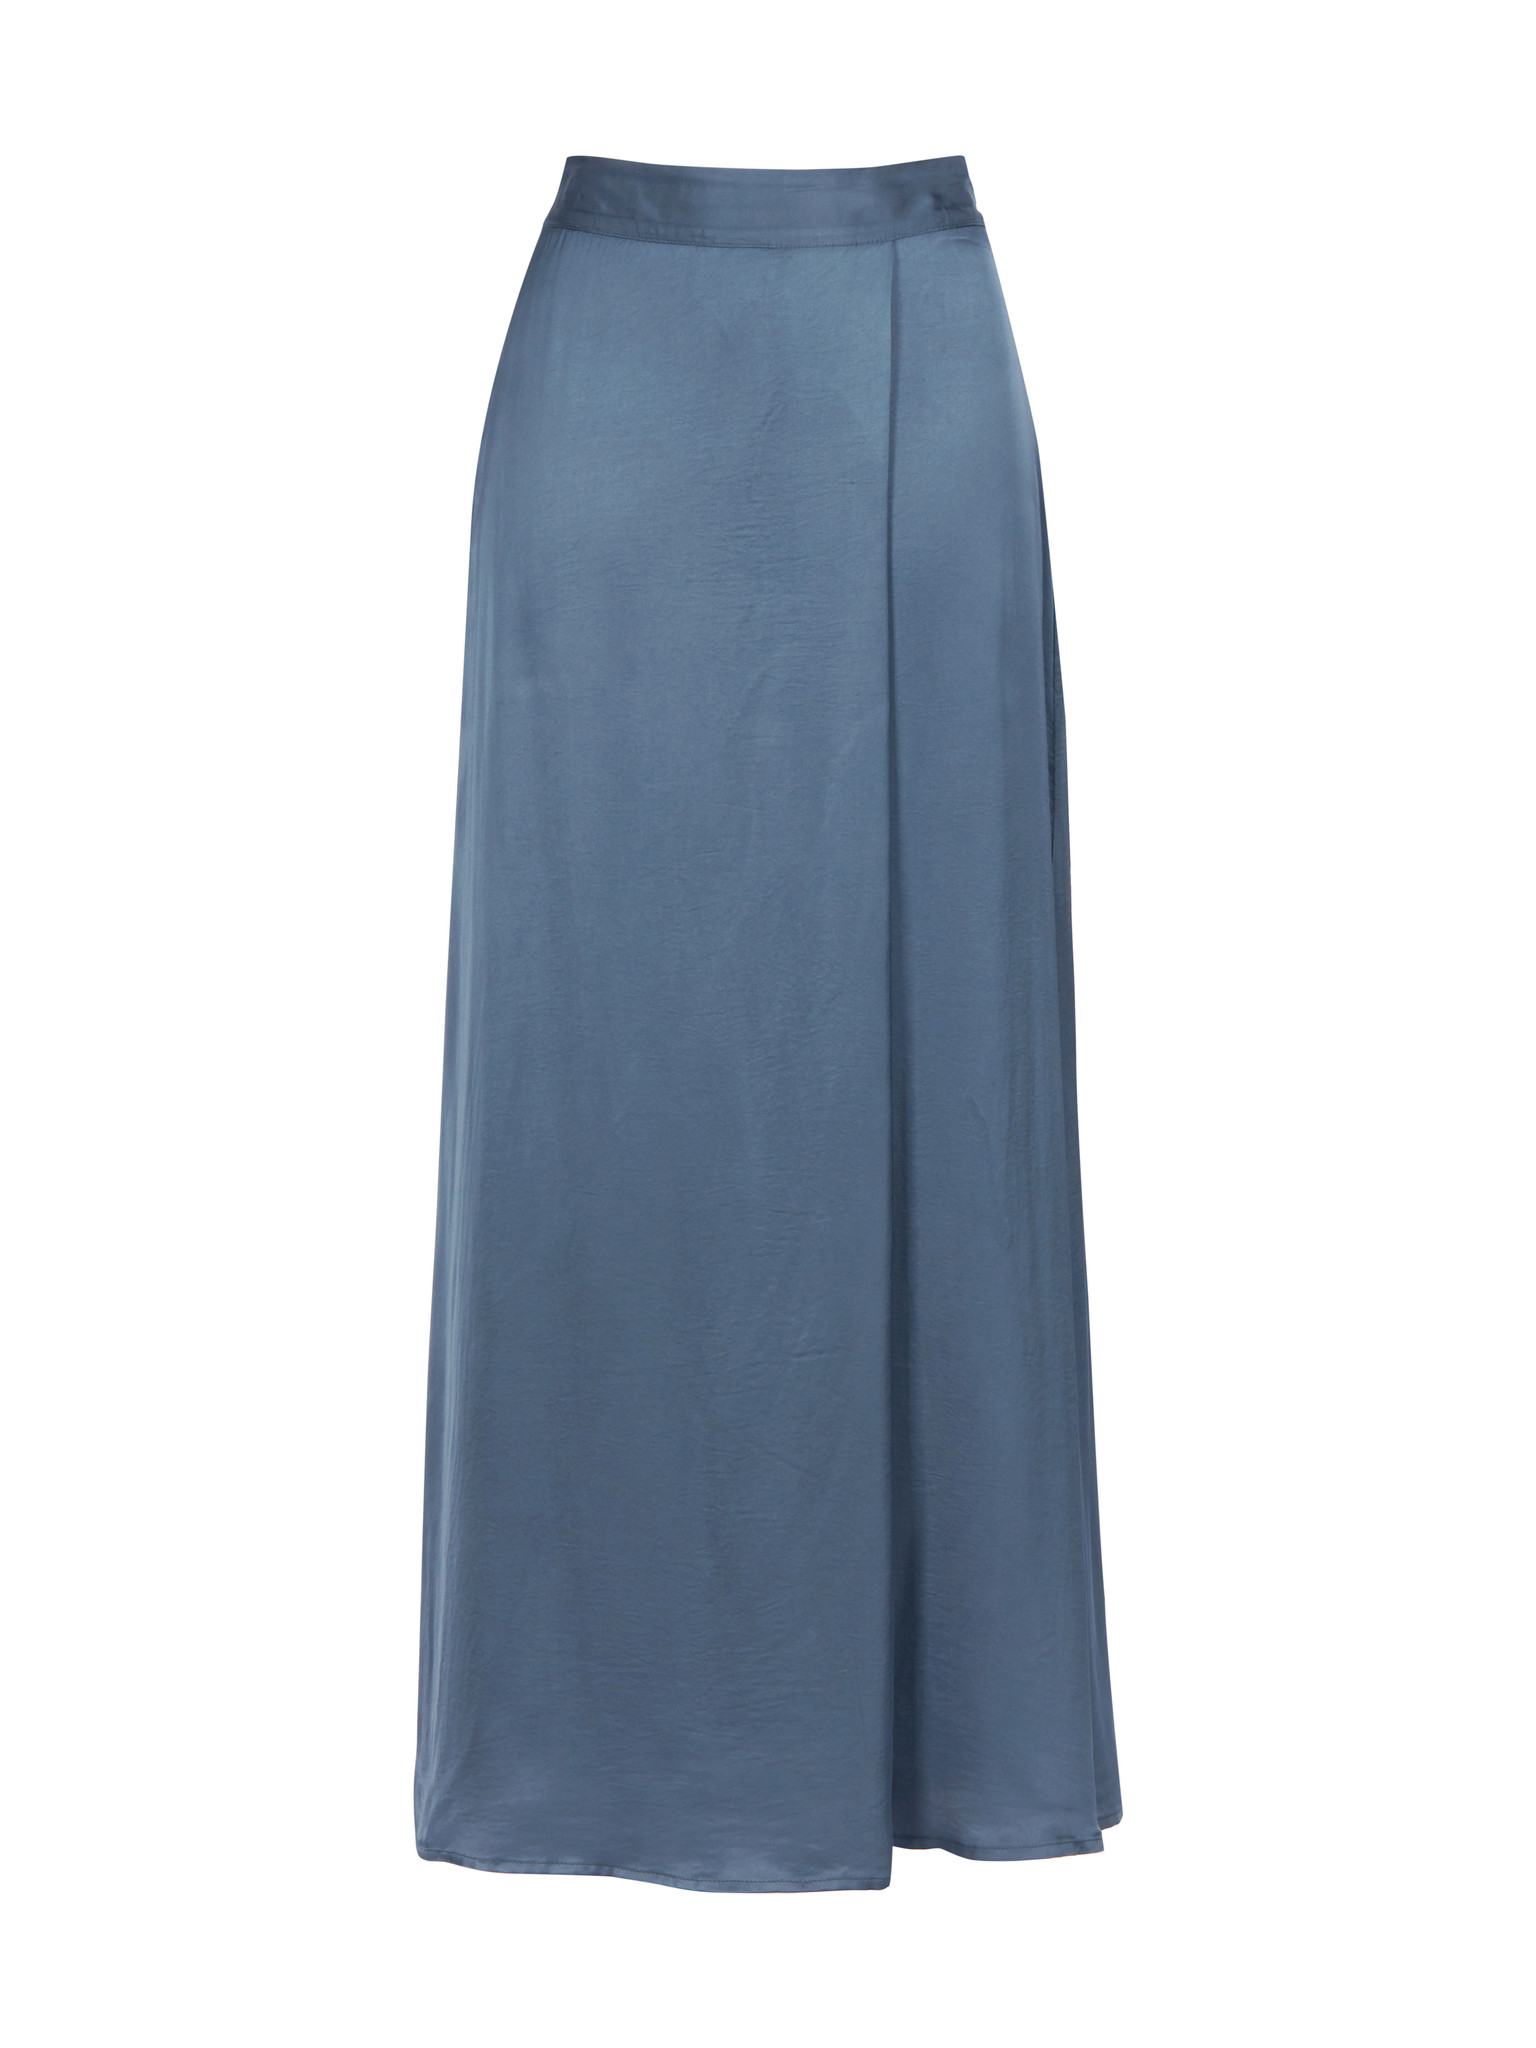 nomansland Skirt 53.208  Bleach Denim-1